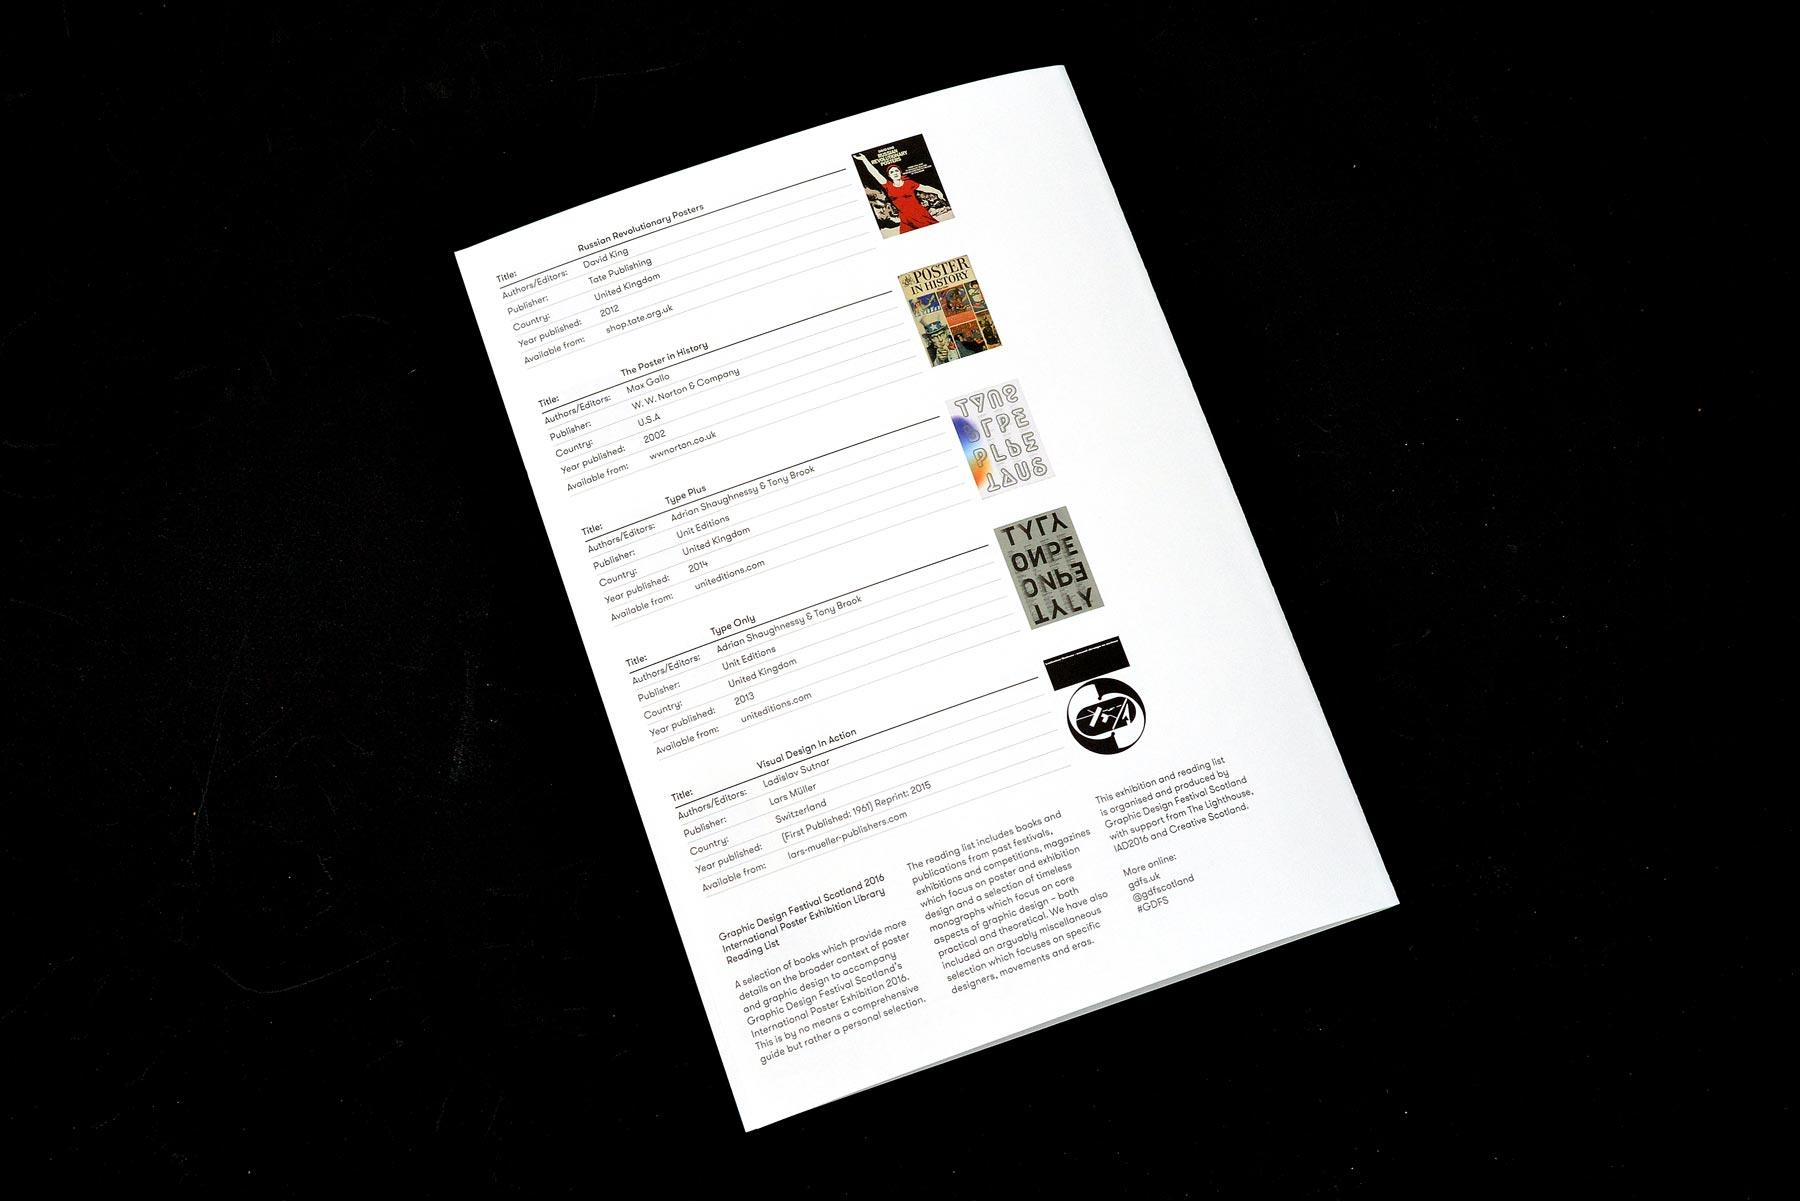 graphic-design-festival-scotland-2016-reading-list3